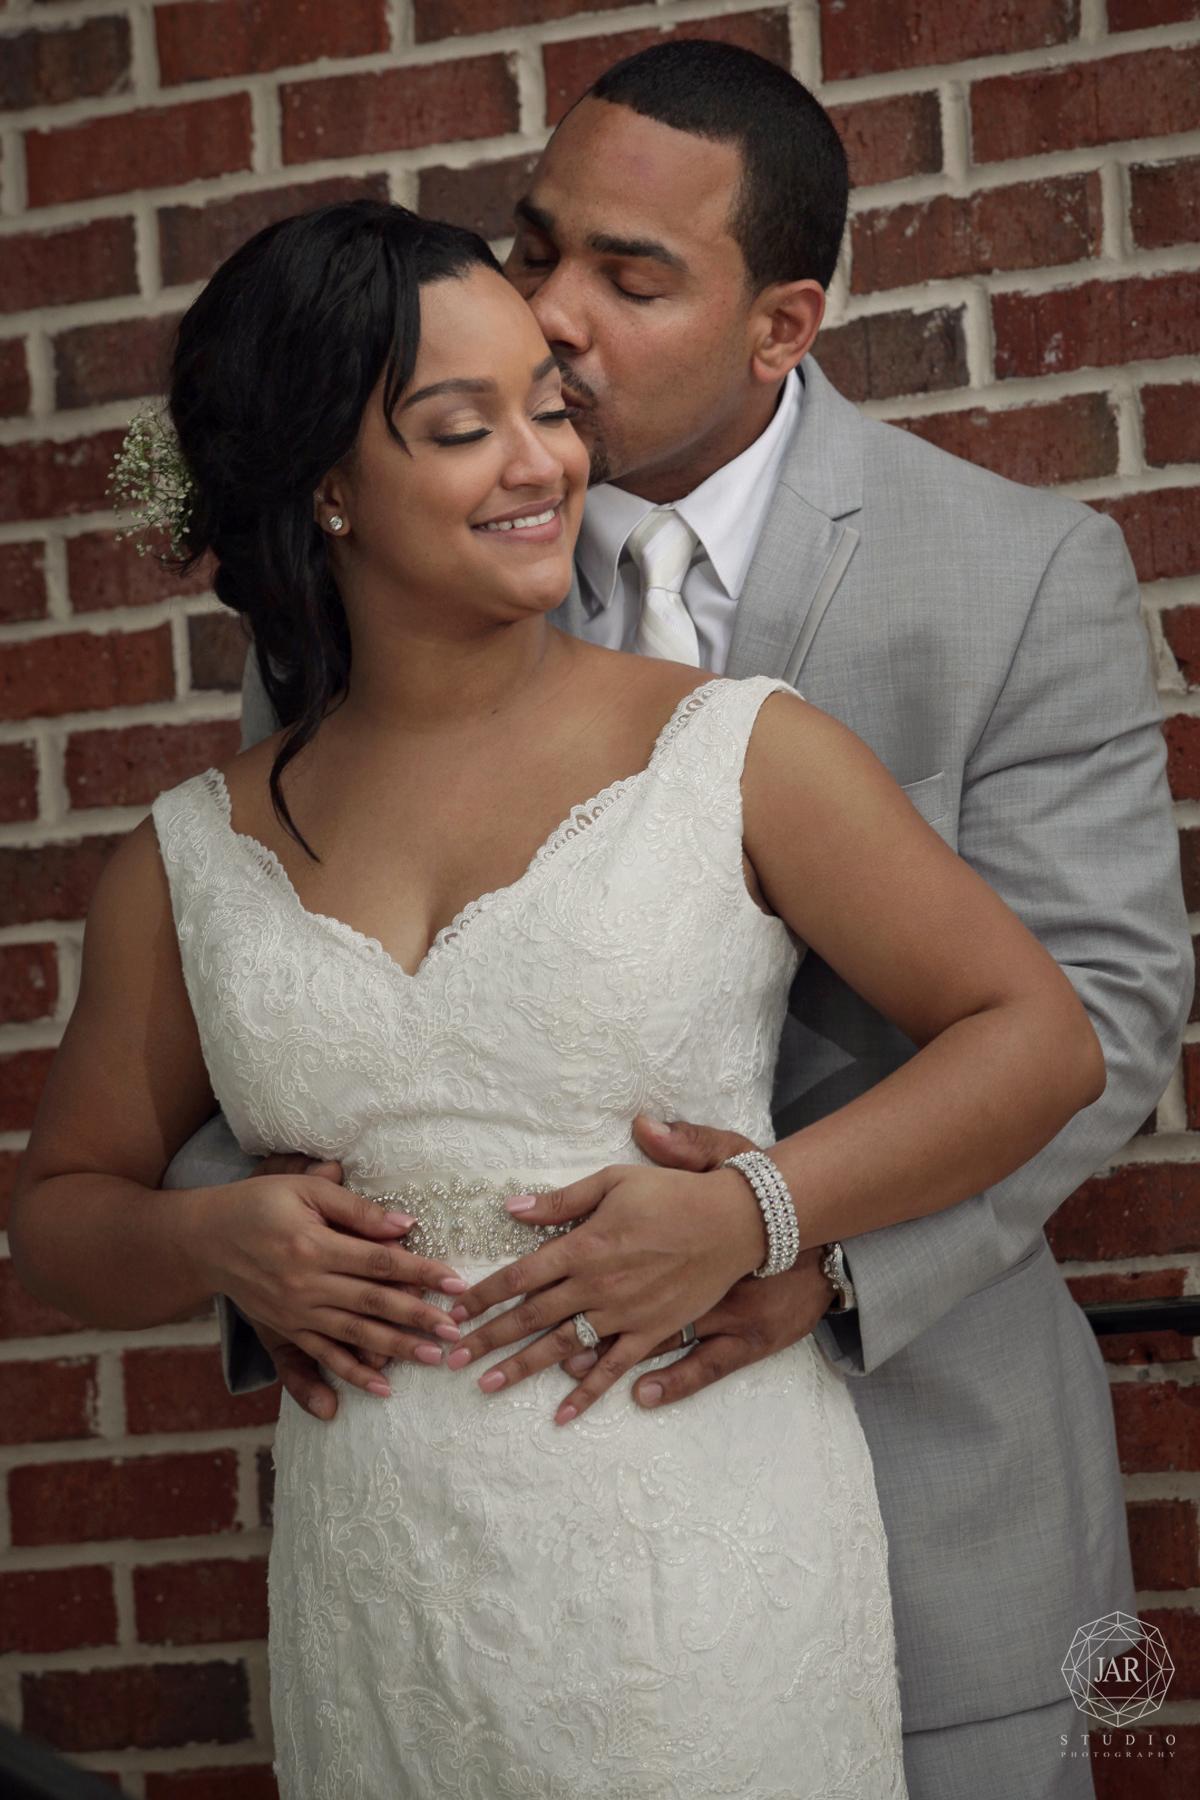 23-romantic-sweet-wedding-photography-jarstudio-orlando-fl.JPG